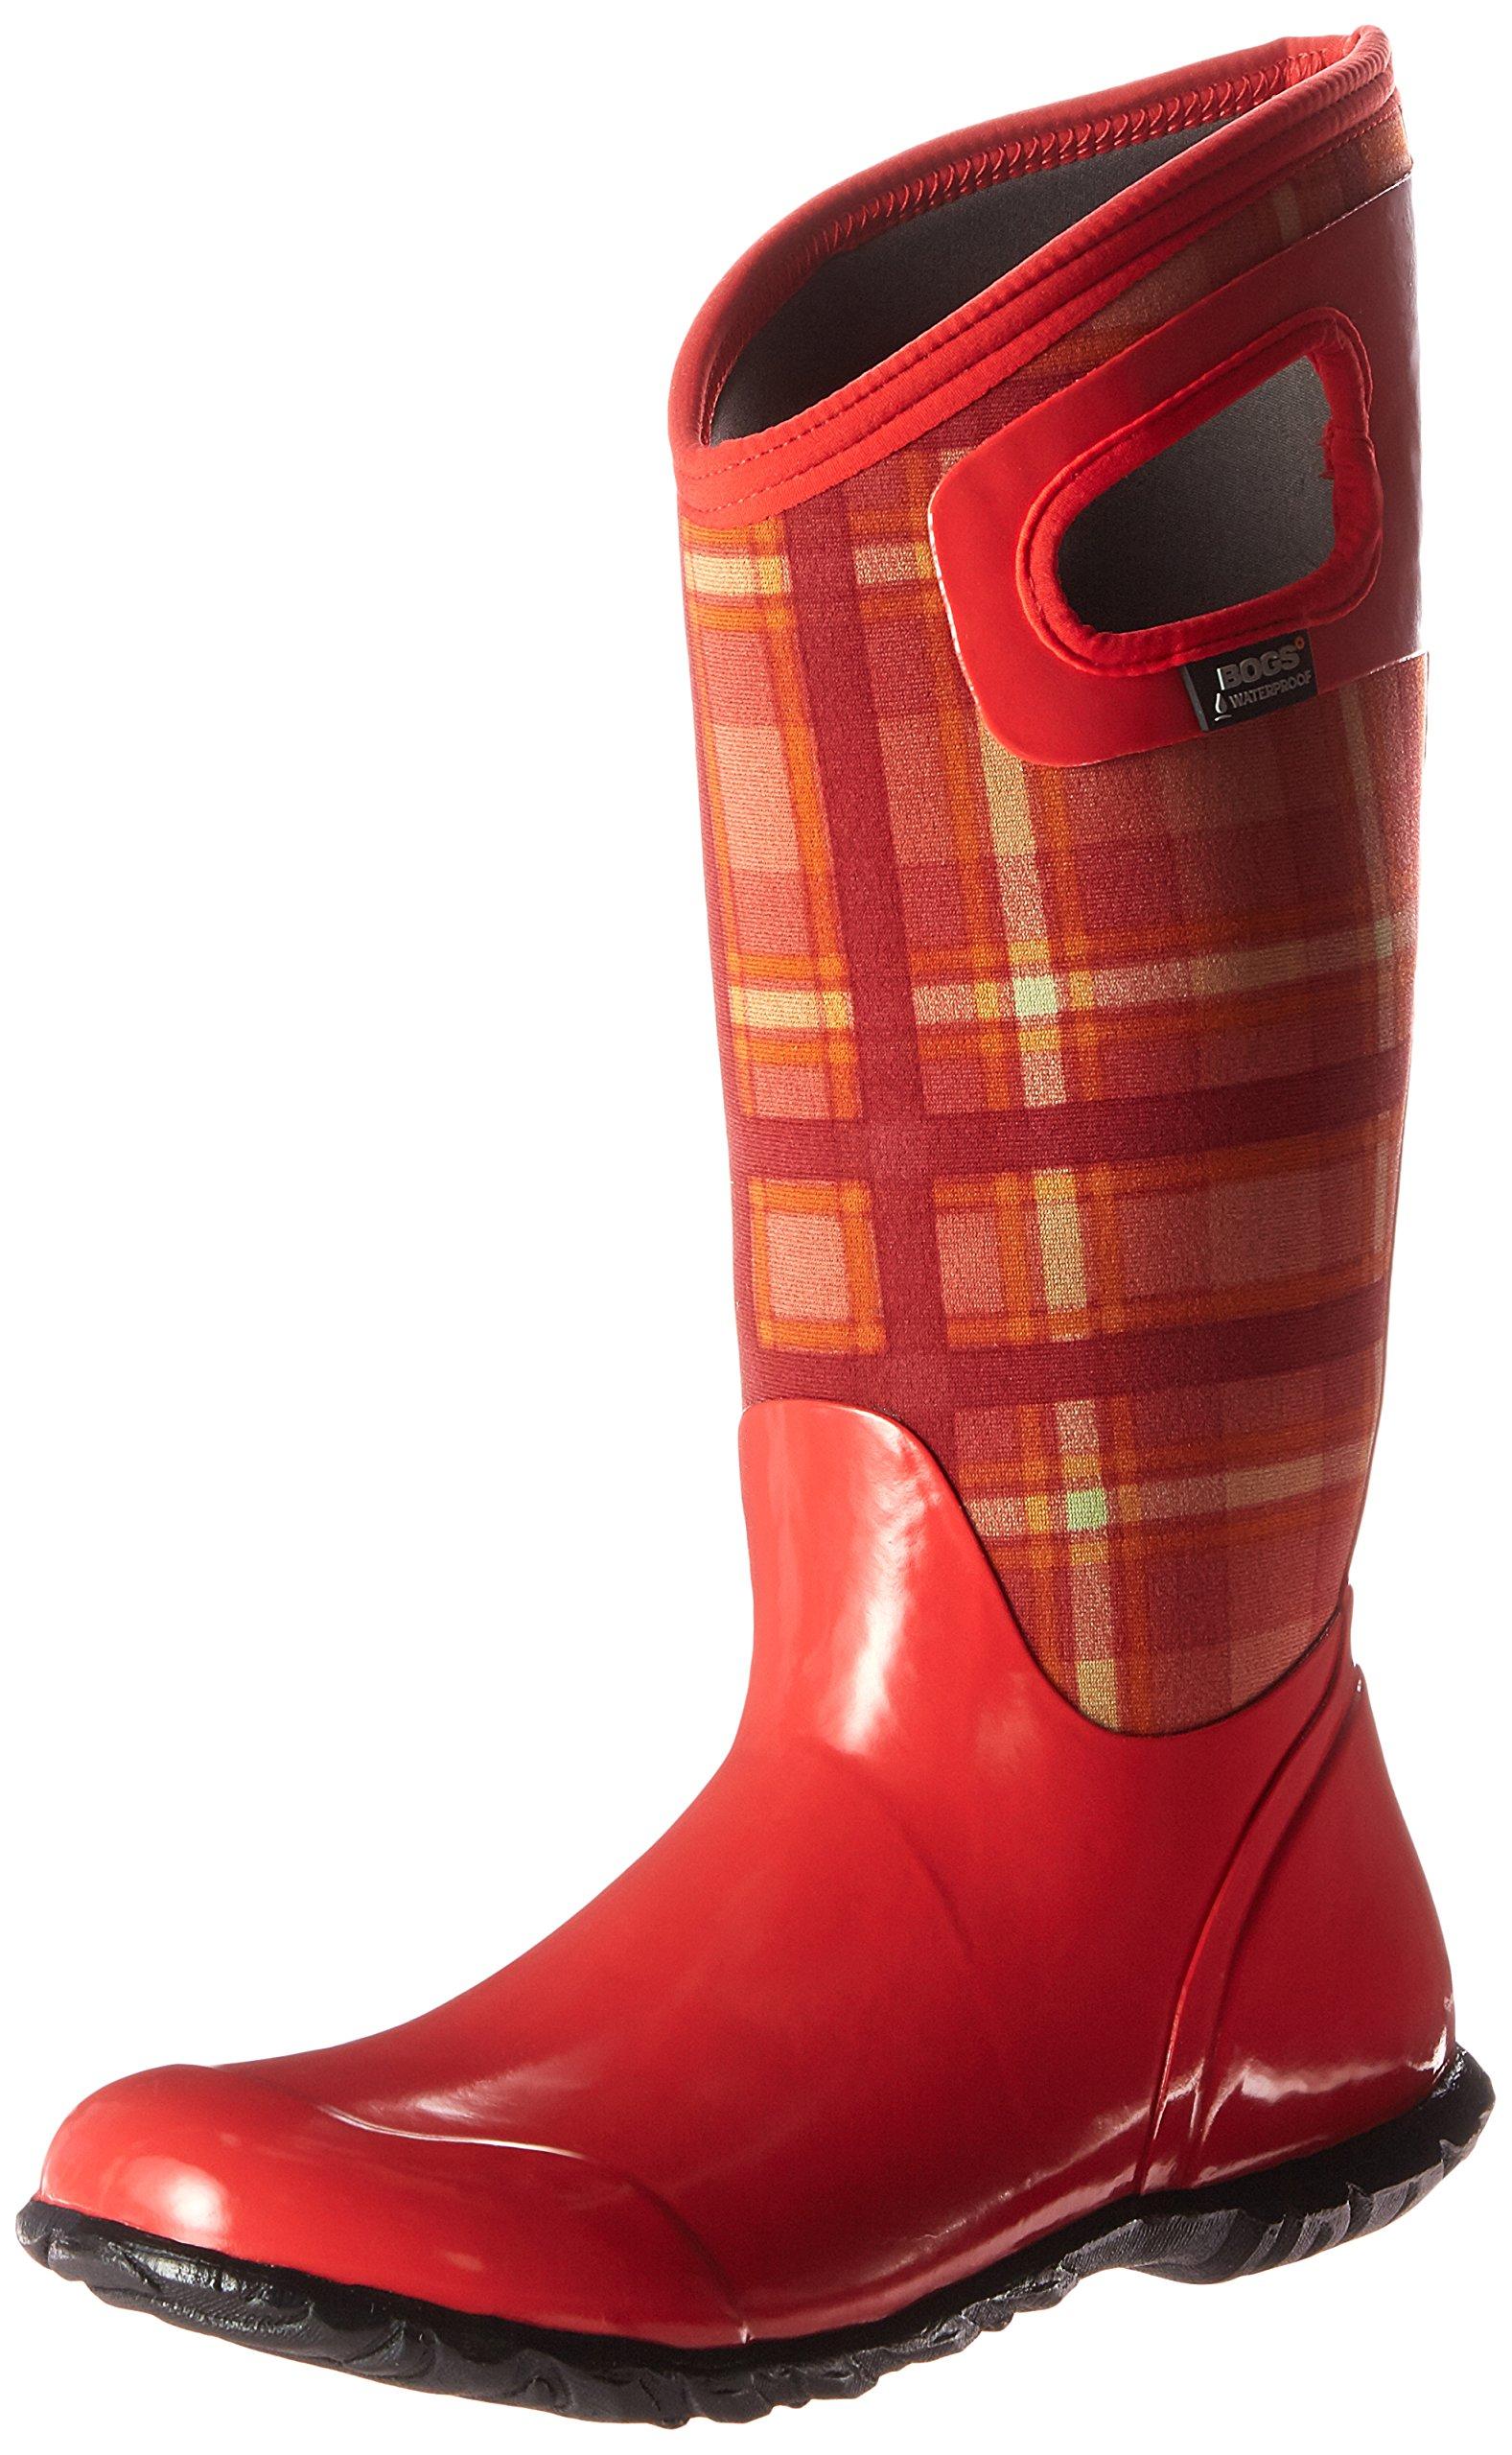 Bogs Women's North Hampton Plaid Winter/Rain Boot, Red/Multi, 6 M US